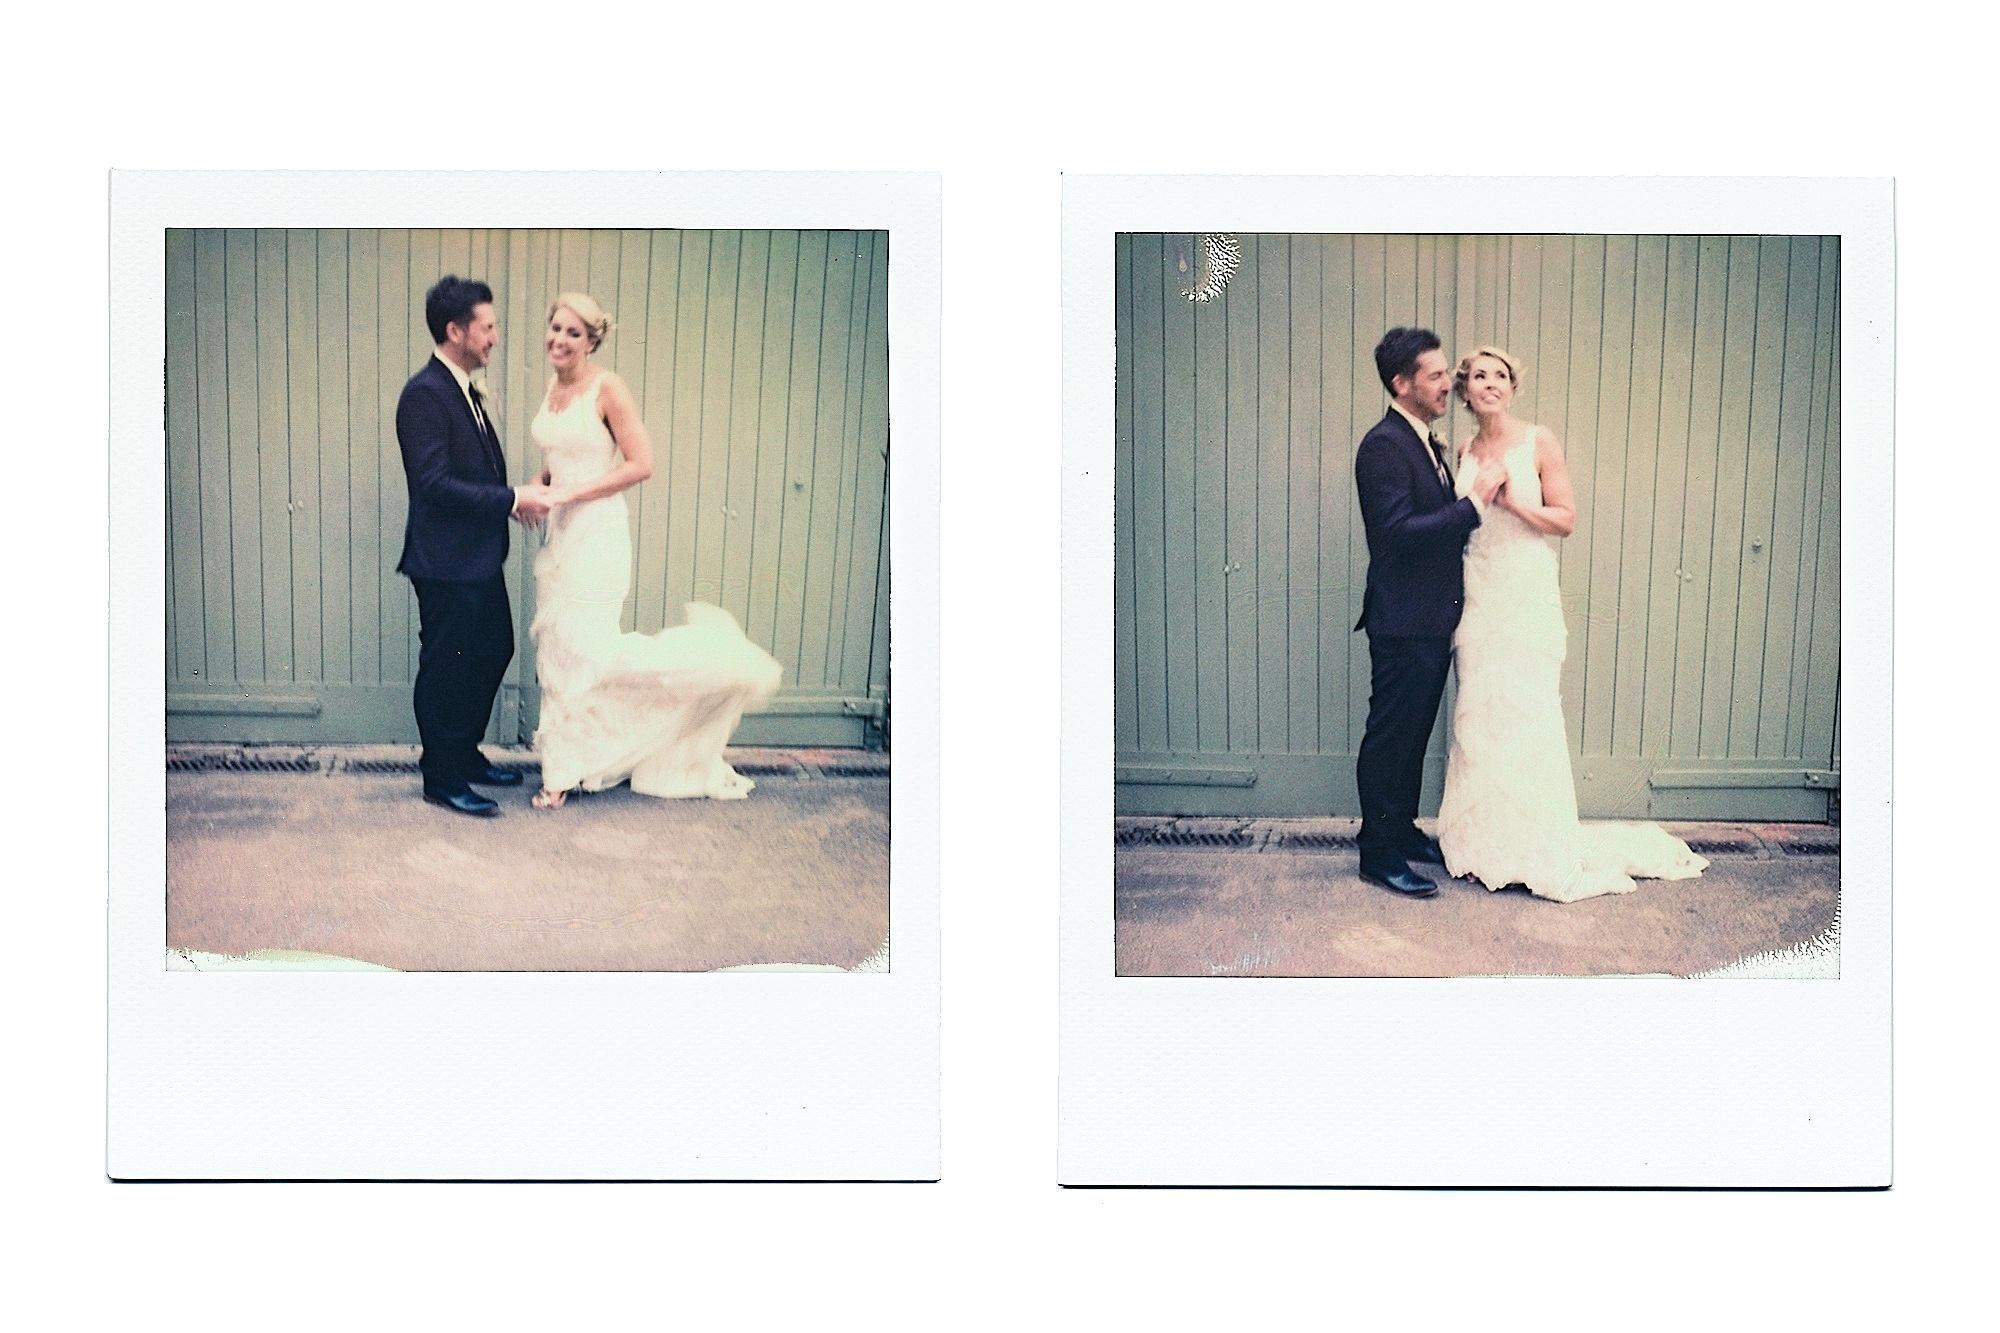 west-mill-derby-polaroid-wedding-photographer-2asee.jpg